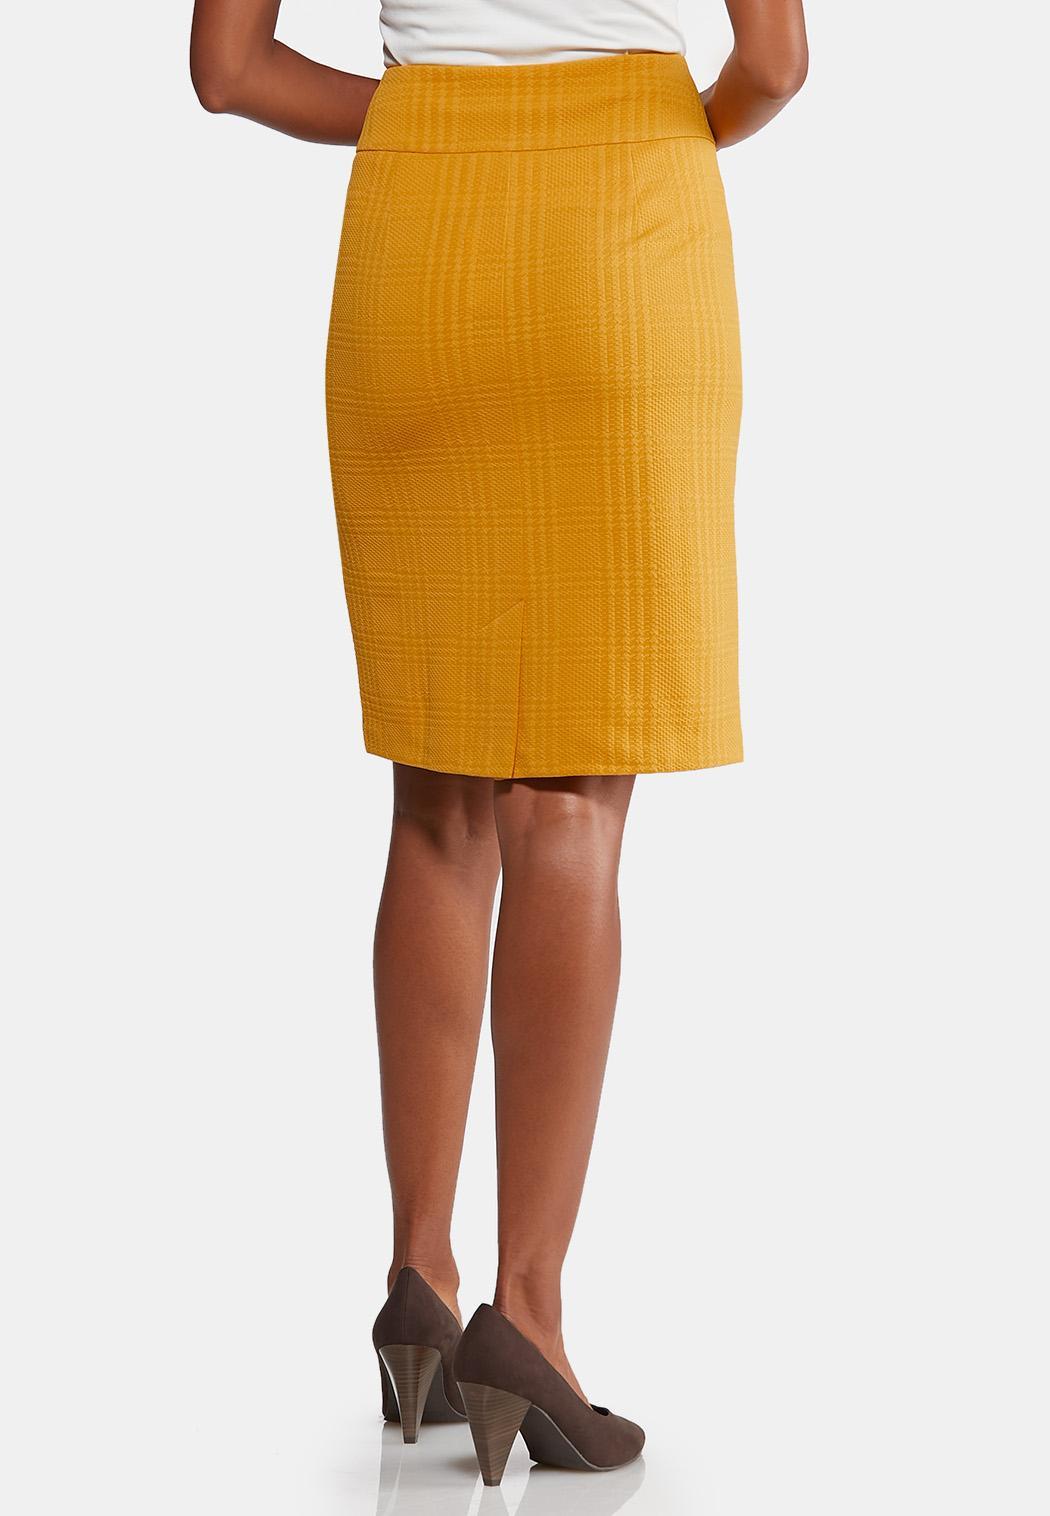 Plus Size Gold Textured Pencil Skirt (Item #43957446)